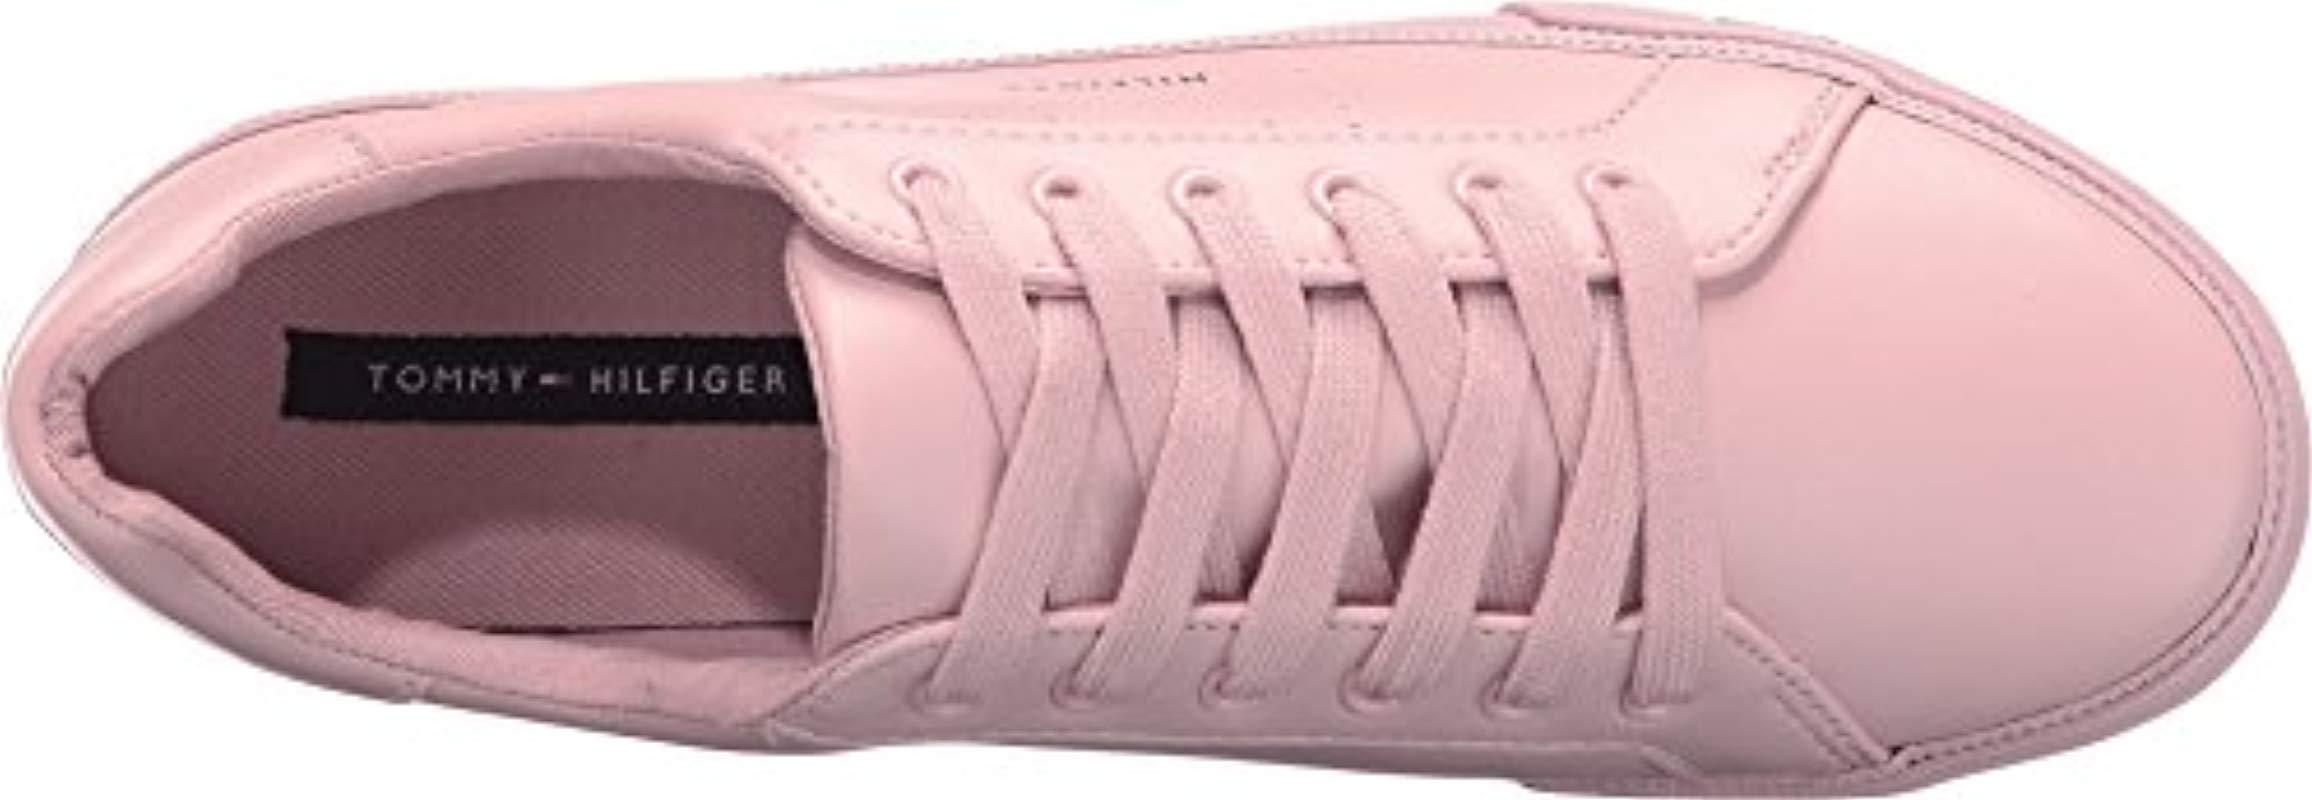 Tommy Hilfiger Luster Sneaker in Blush